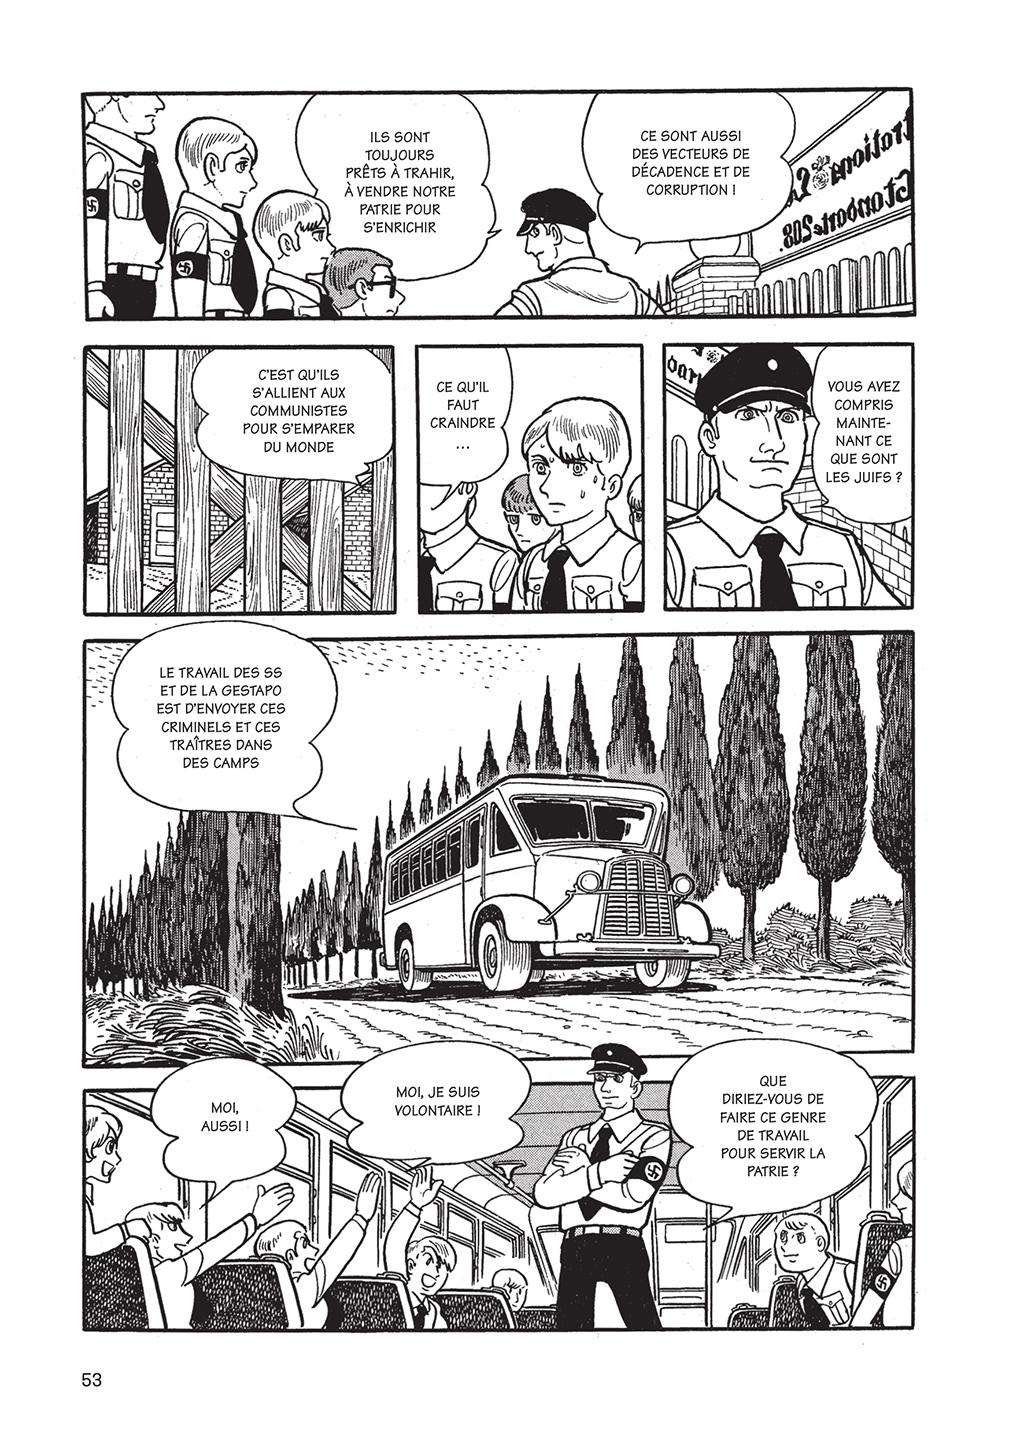 L Histoire Des 3 Adolf : histoire, adolf, L'histoire, Adolf,, Osamu, Tezuka,, Éditions, Delcourt